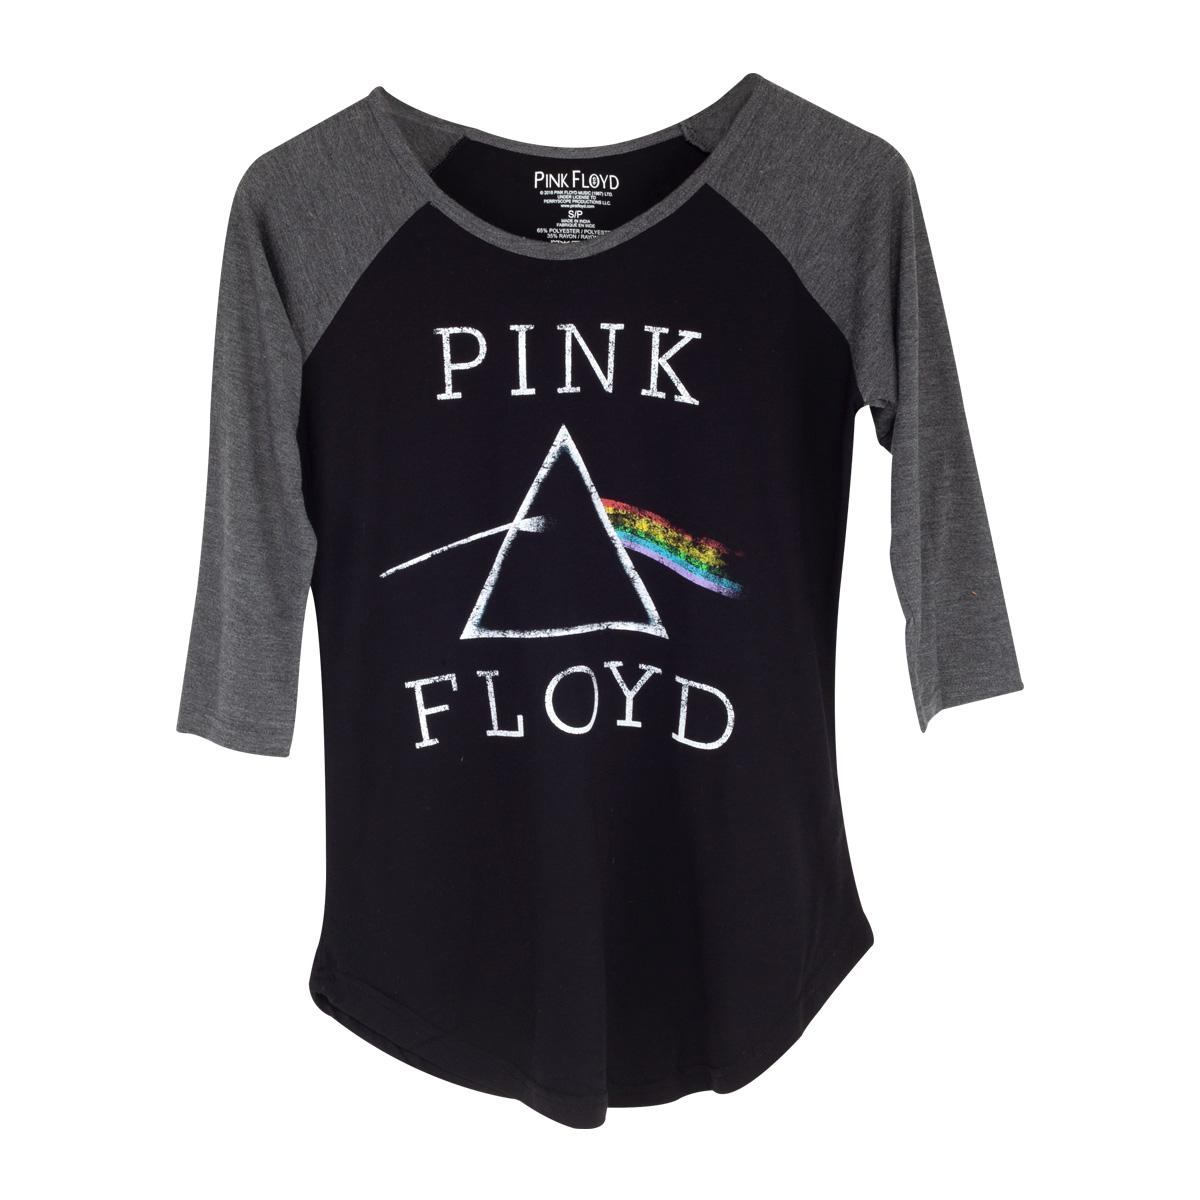 Pink Floyd The Dark Side Of The Moon Logo Black & Grey Raglan